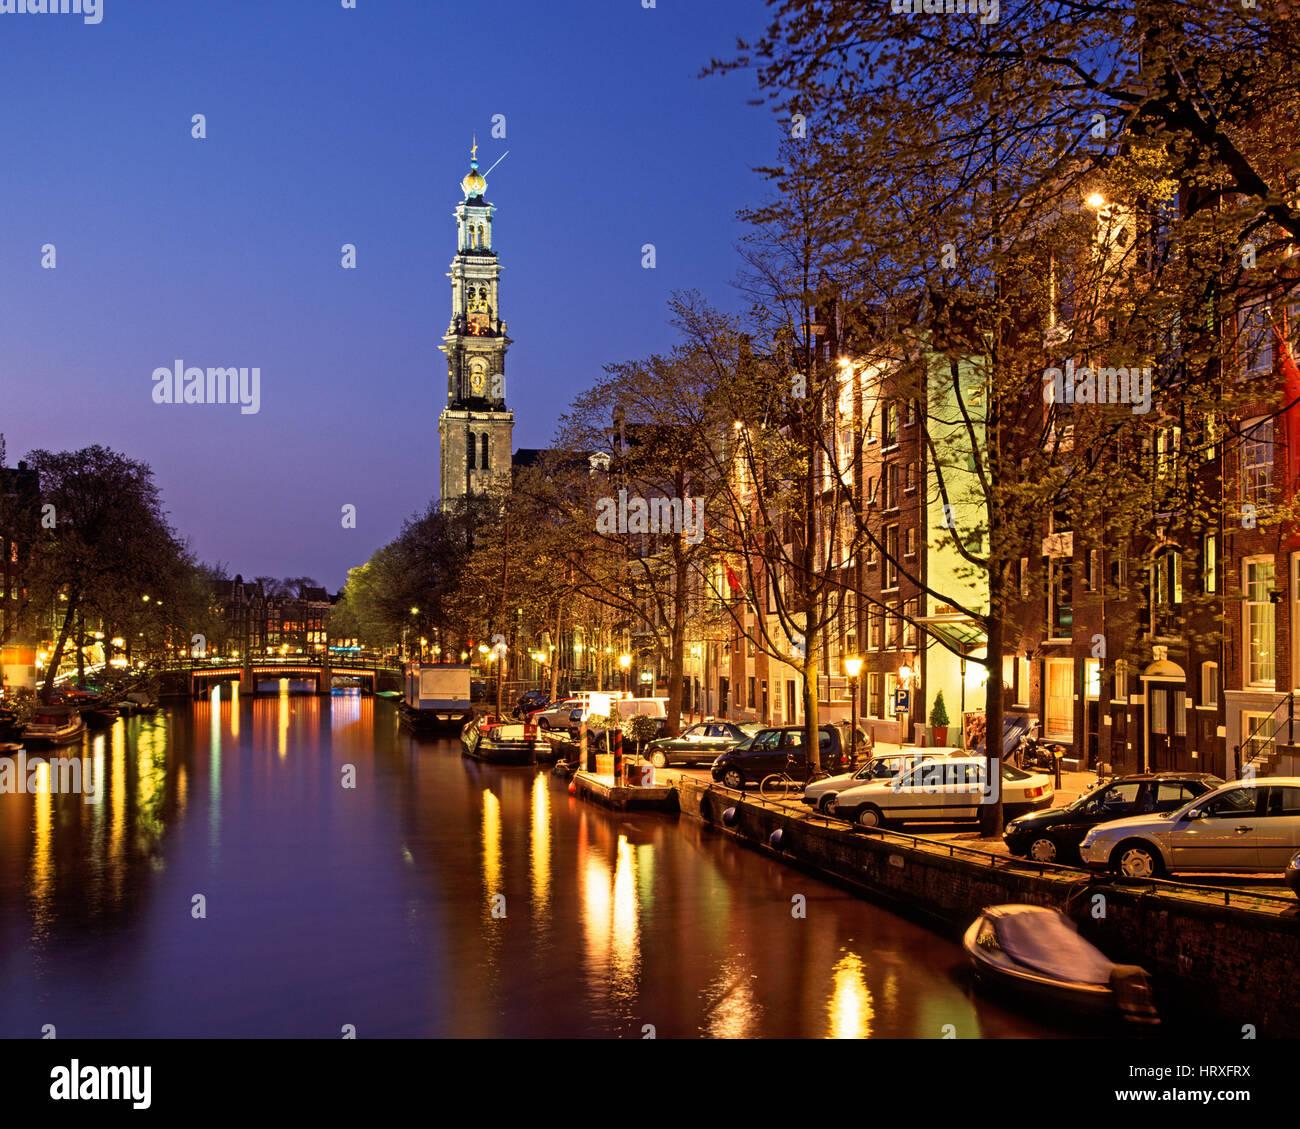 Prinsengracht and Westerkerk, Amsterdam, Holland, Netherlands. - Stock Image